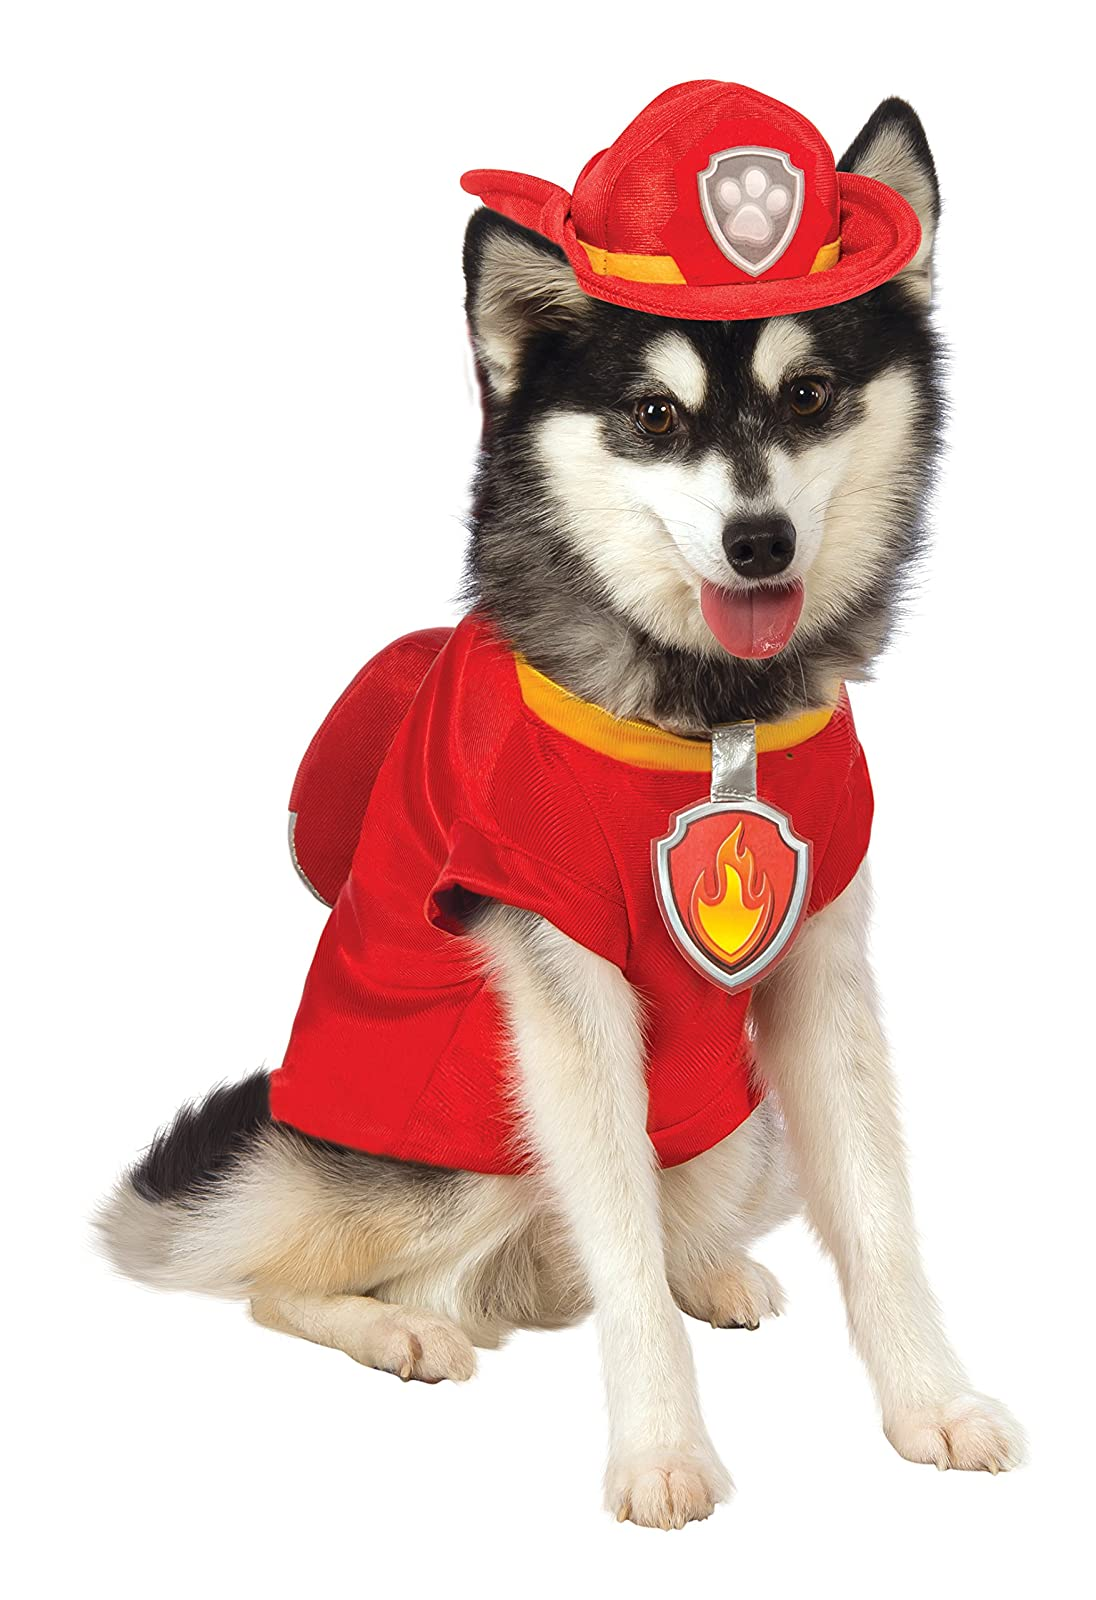 Paw Patrol Marshall Dog Costume 580211 XL Marshall - 1